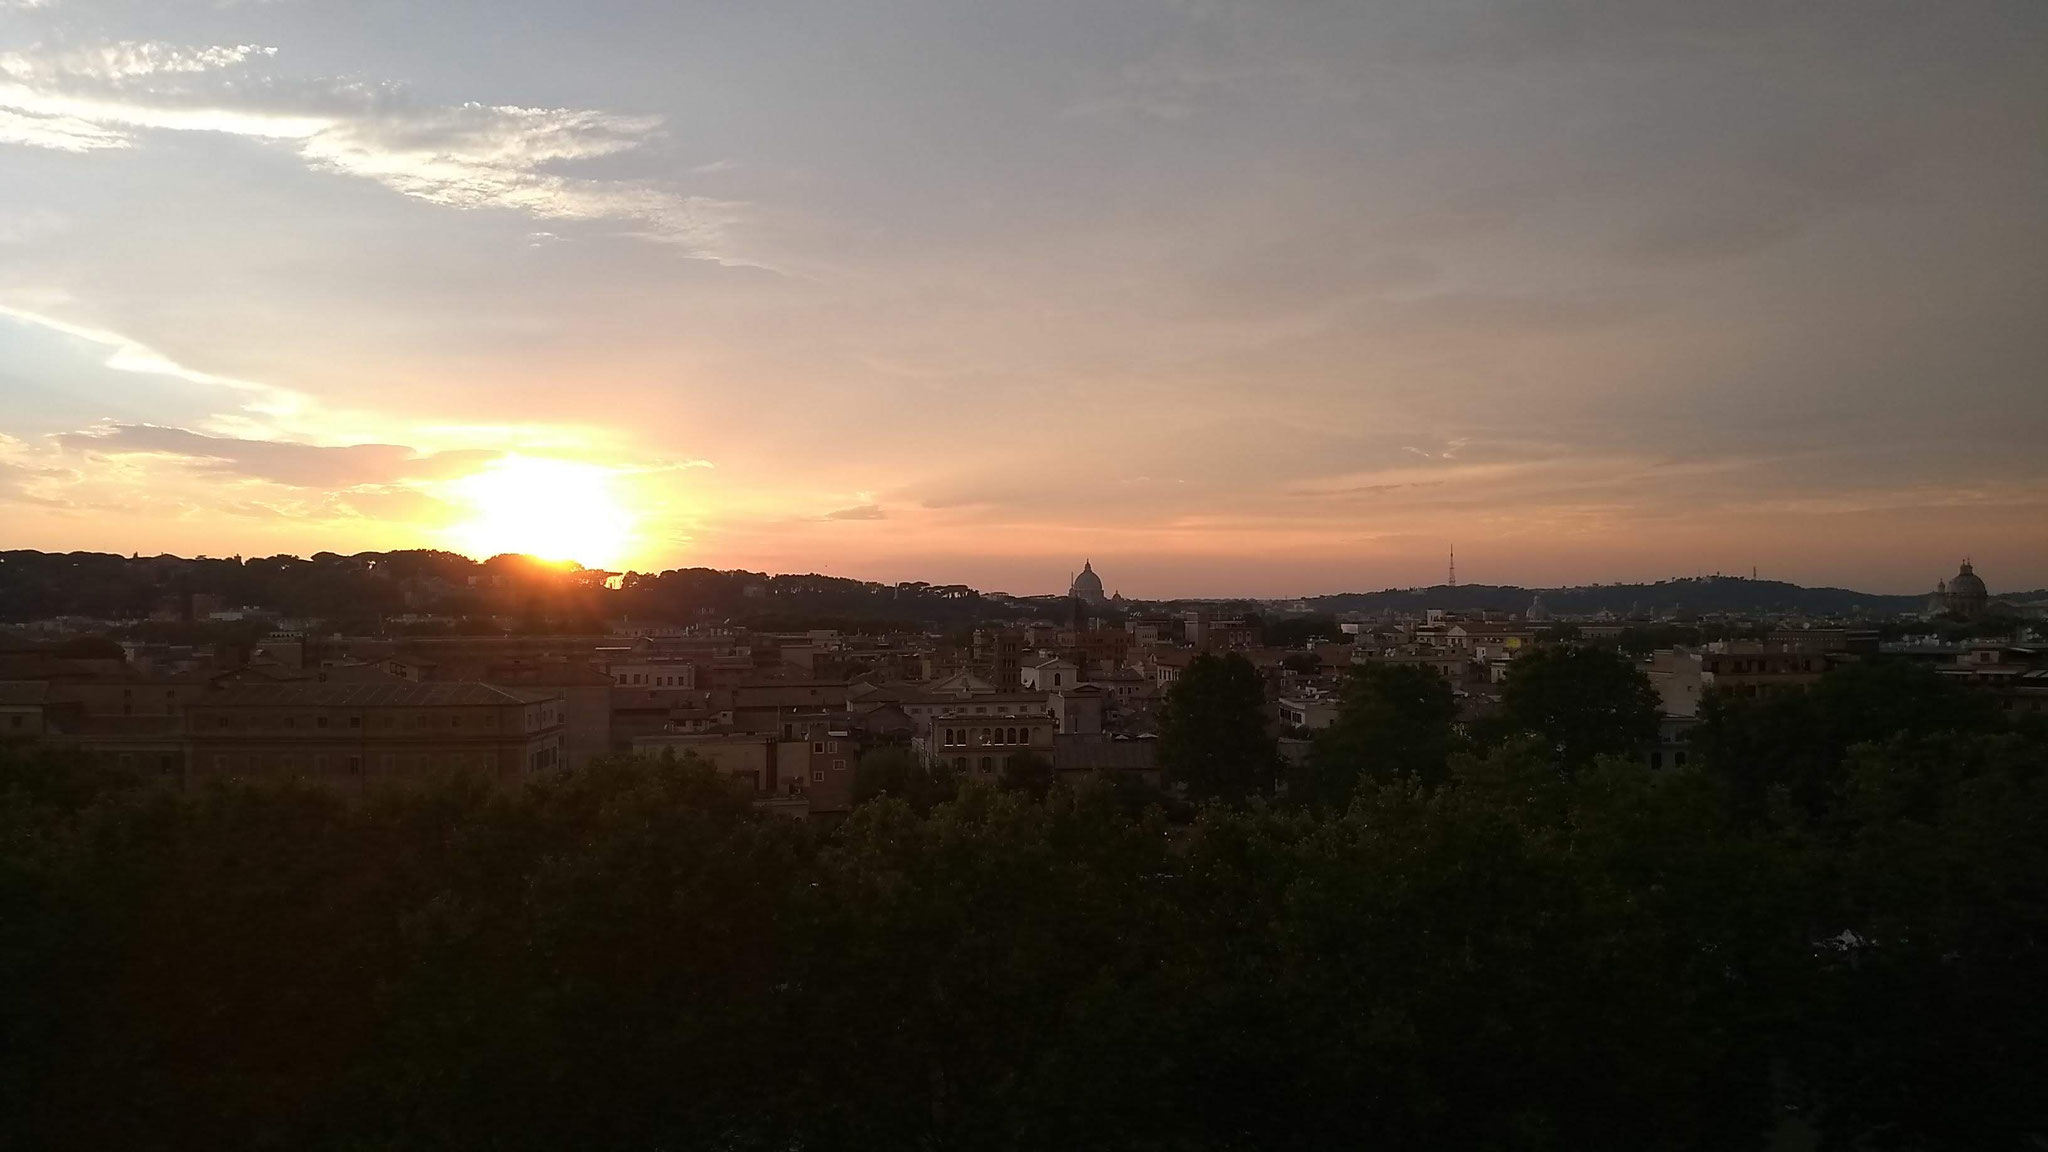 Sonnenuntergang auf dem Aventin